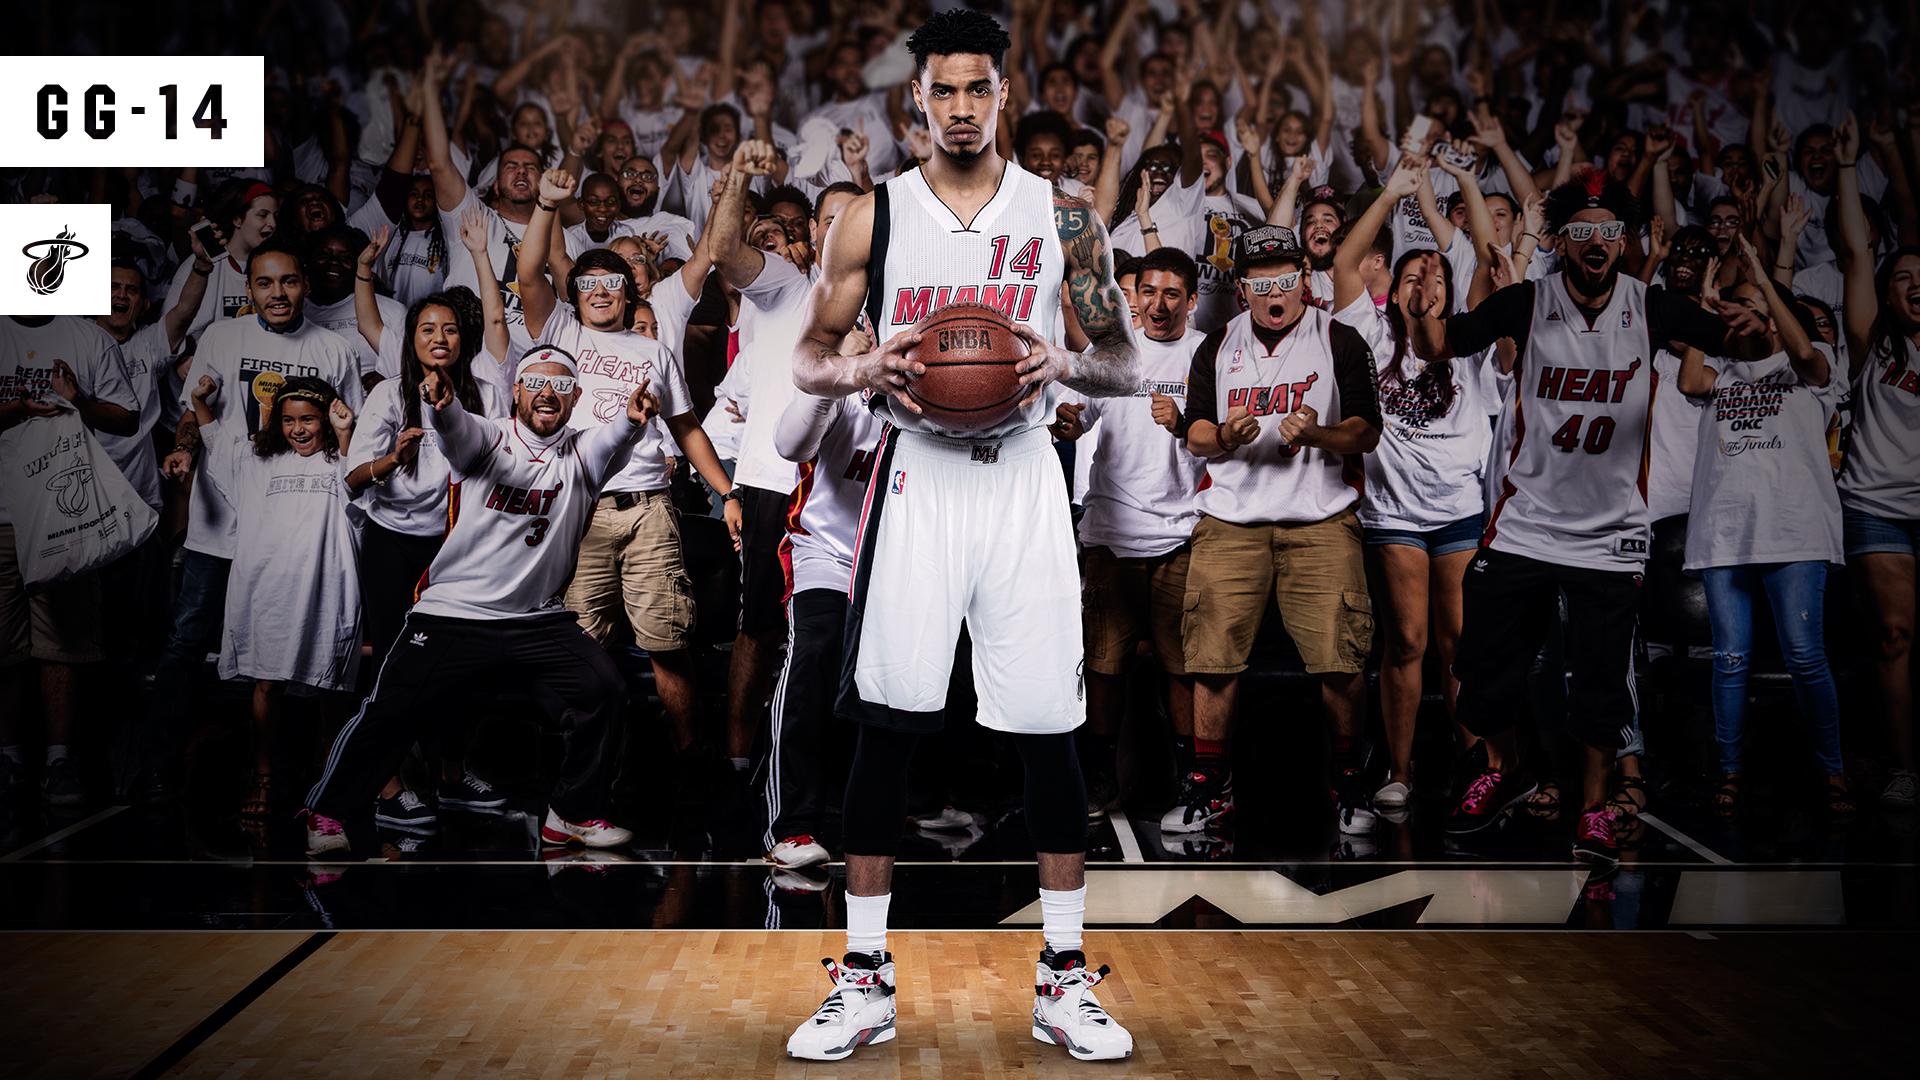 Nba Basketball Miami Heat Bedroom In: Miami Heat Screensavers And Wallpaper